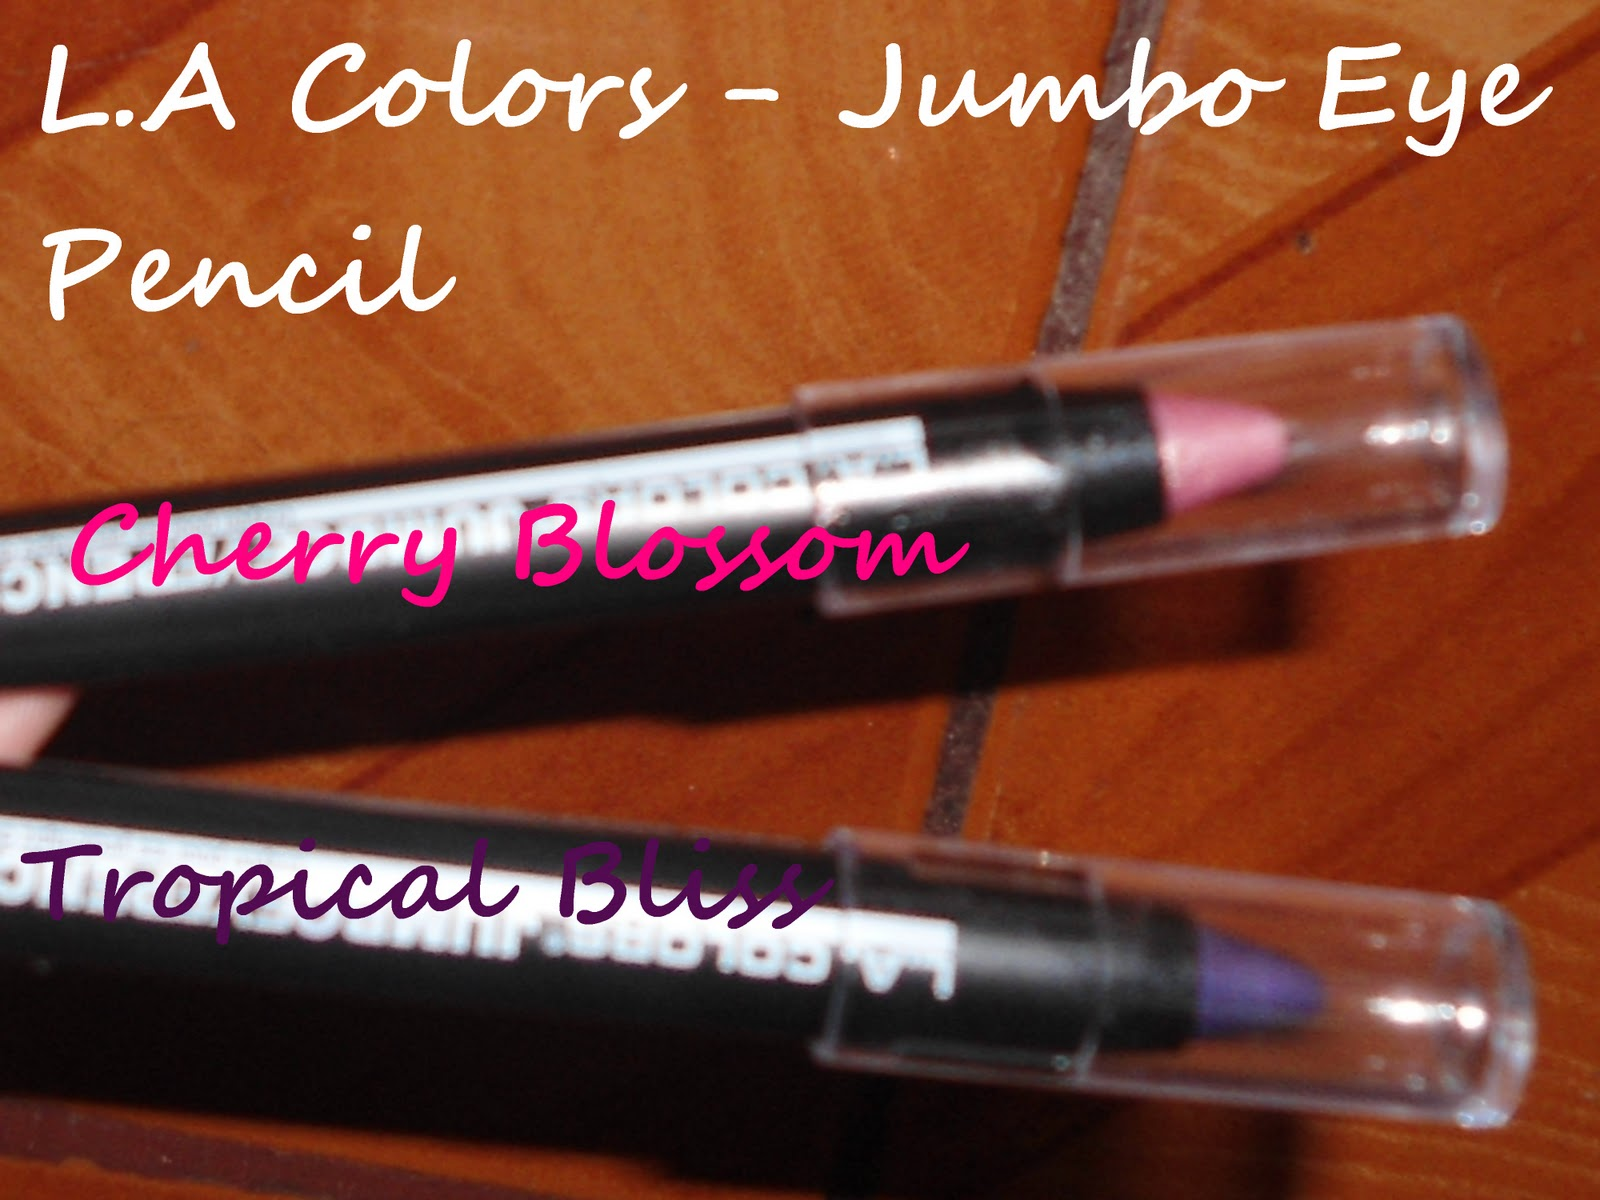 how to use la colors jumbo eye pencil